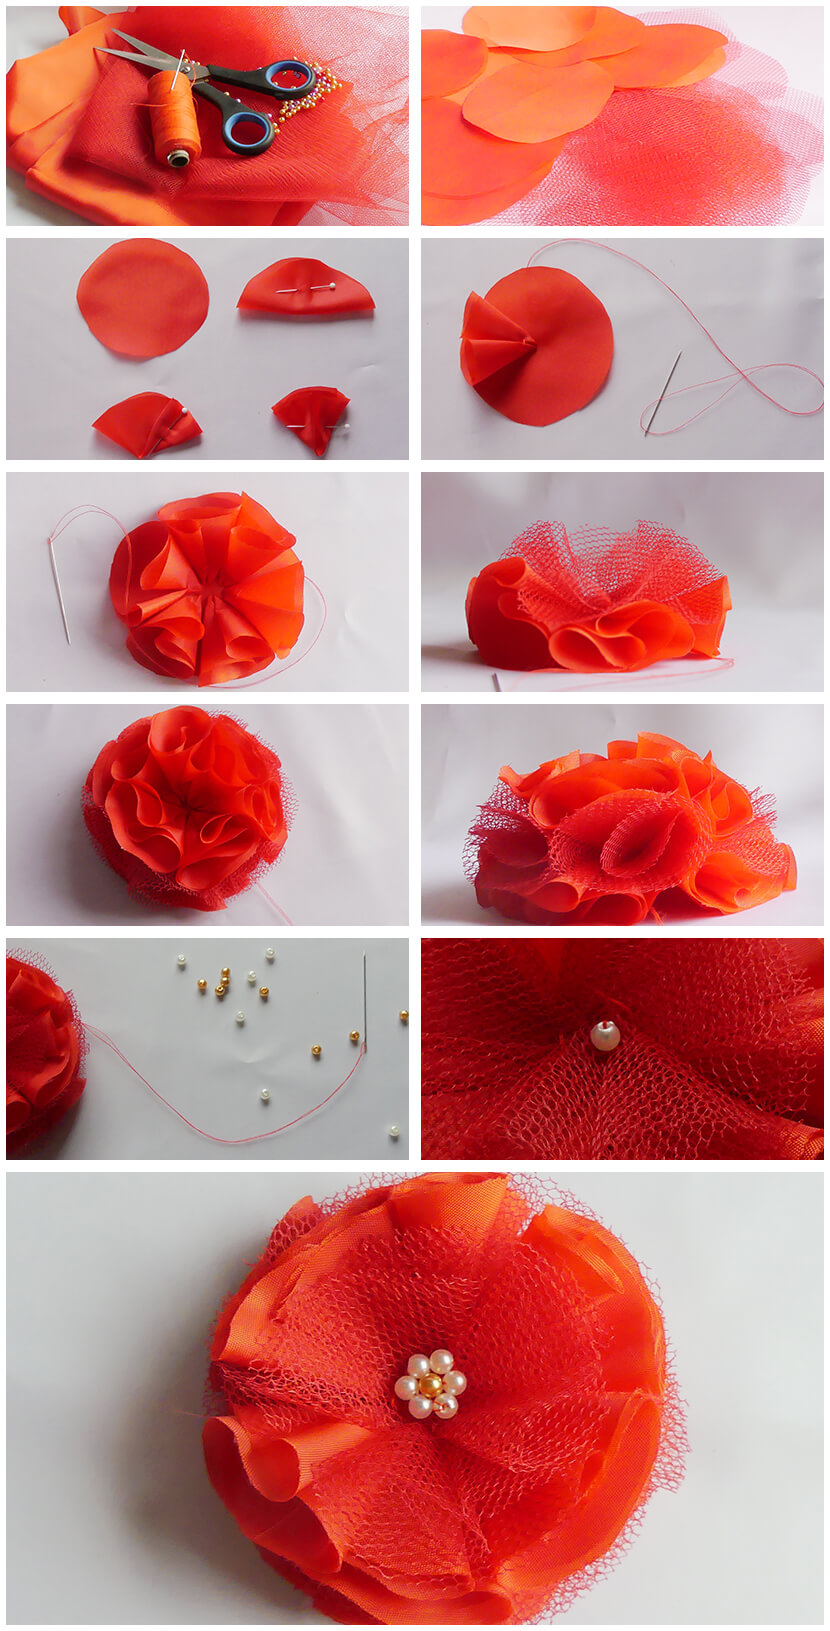 Jak vyrobit květinovou brož - Little BIG ART - Vyrobte si sami